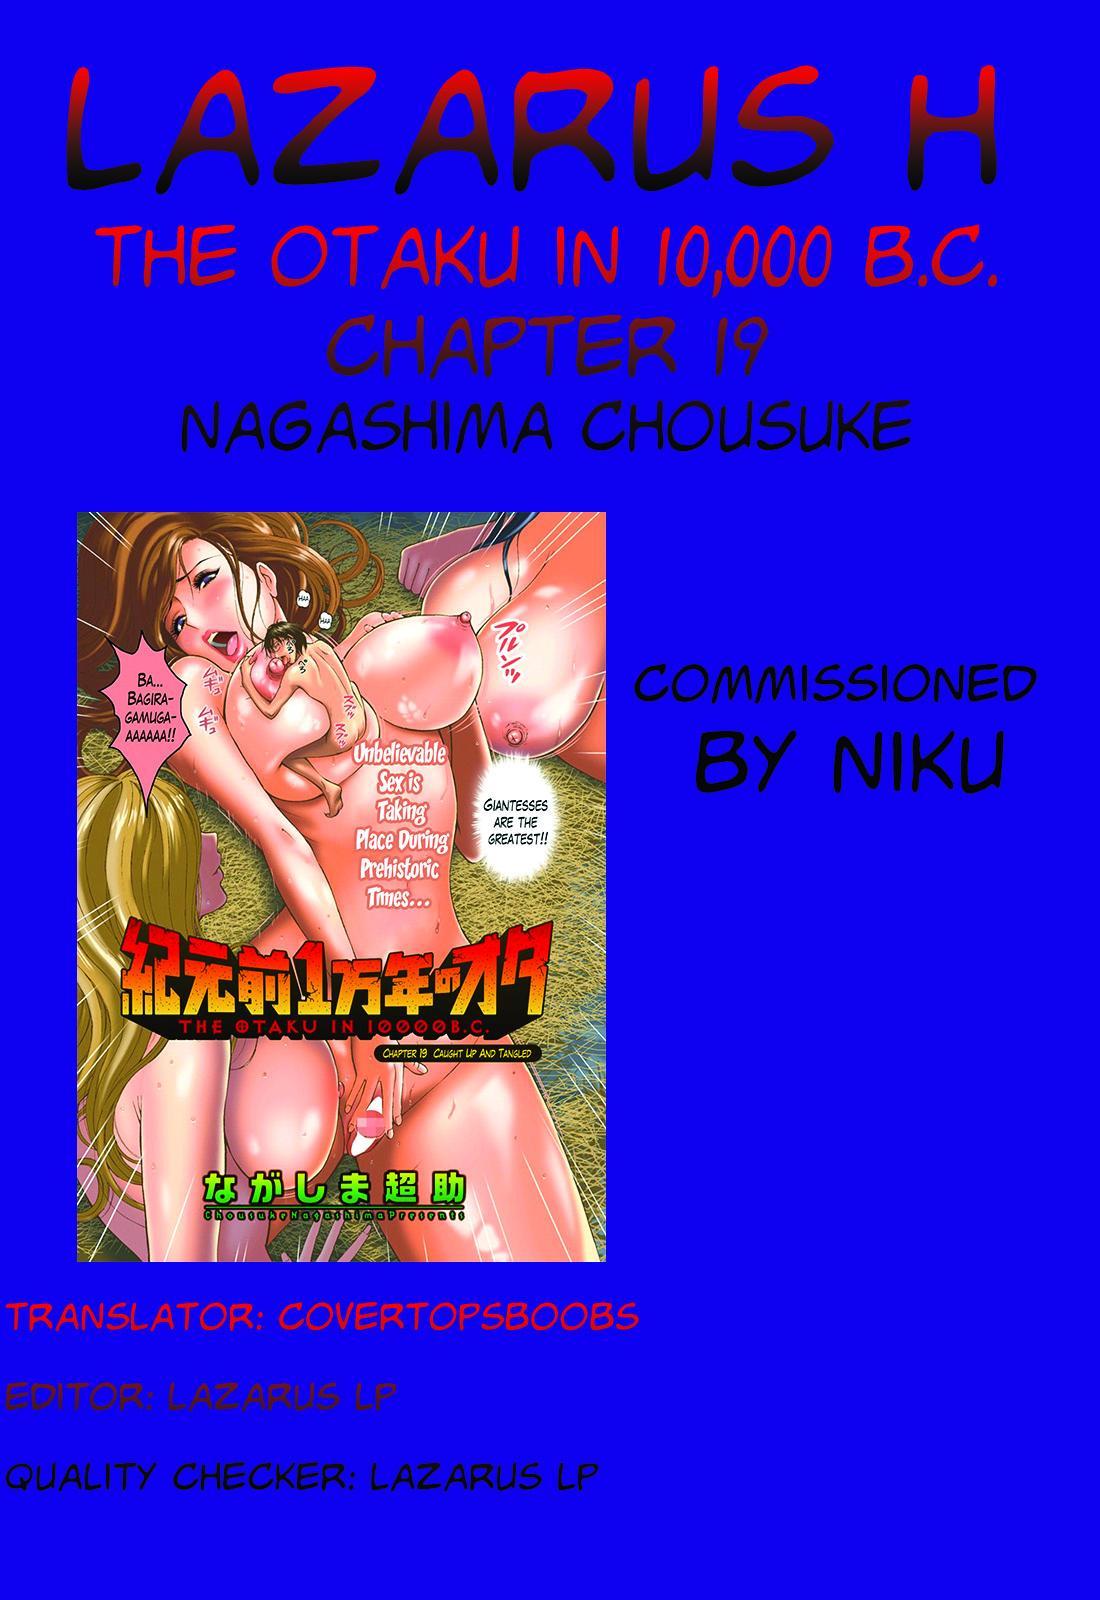 Kigenzen 10000 Nen no Ota   The Otaku in 10,000 B.C. Ch. 1-22 365